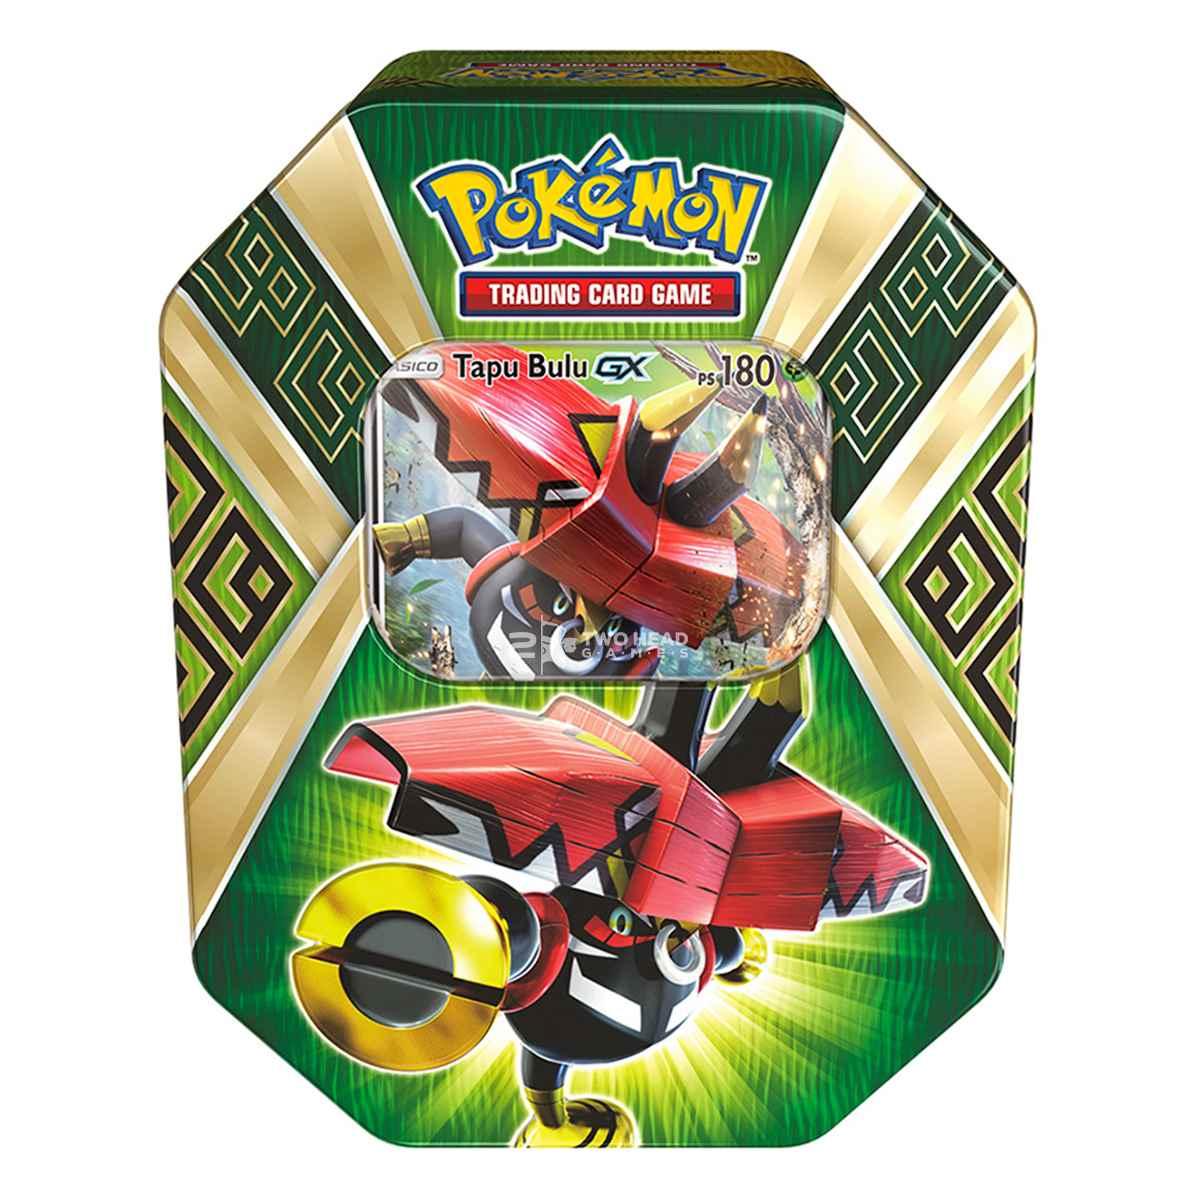 Pokemon Lata Guardiões das Ilhas Tapu Bulu Gx